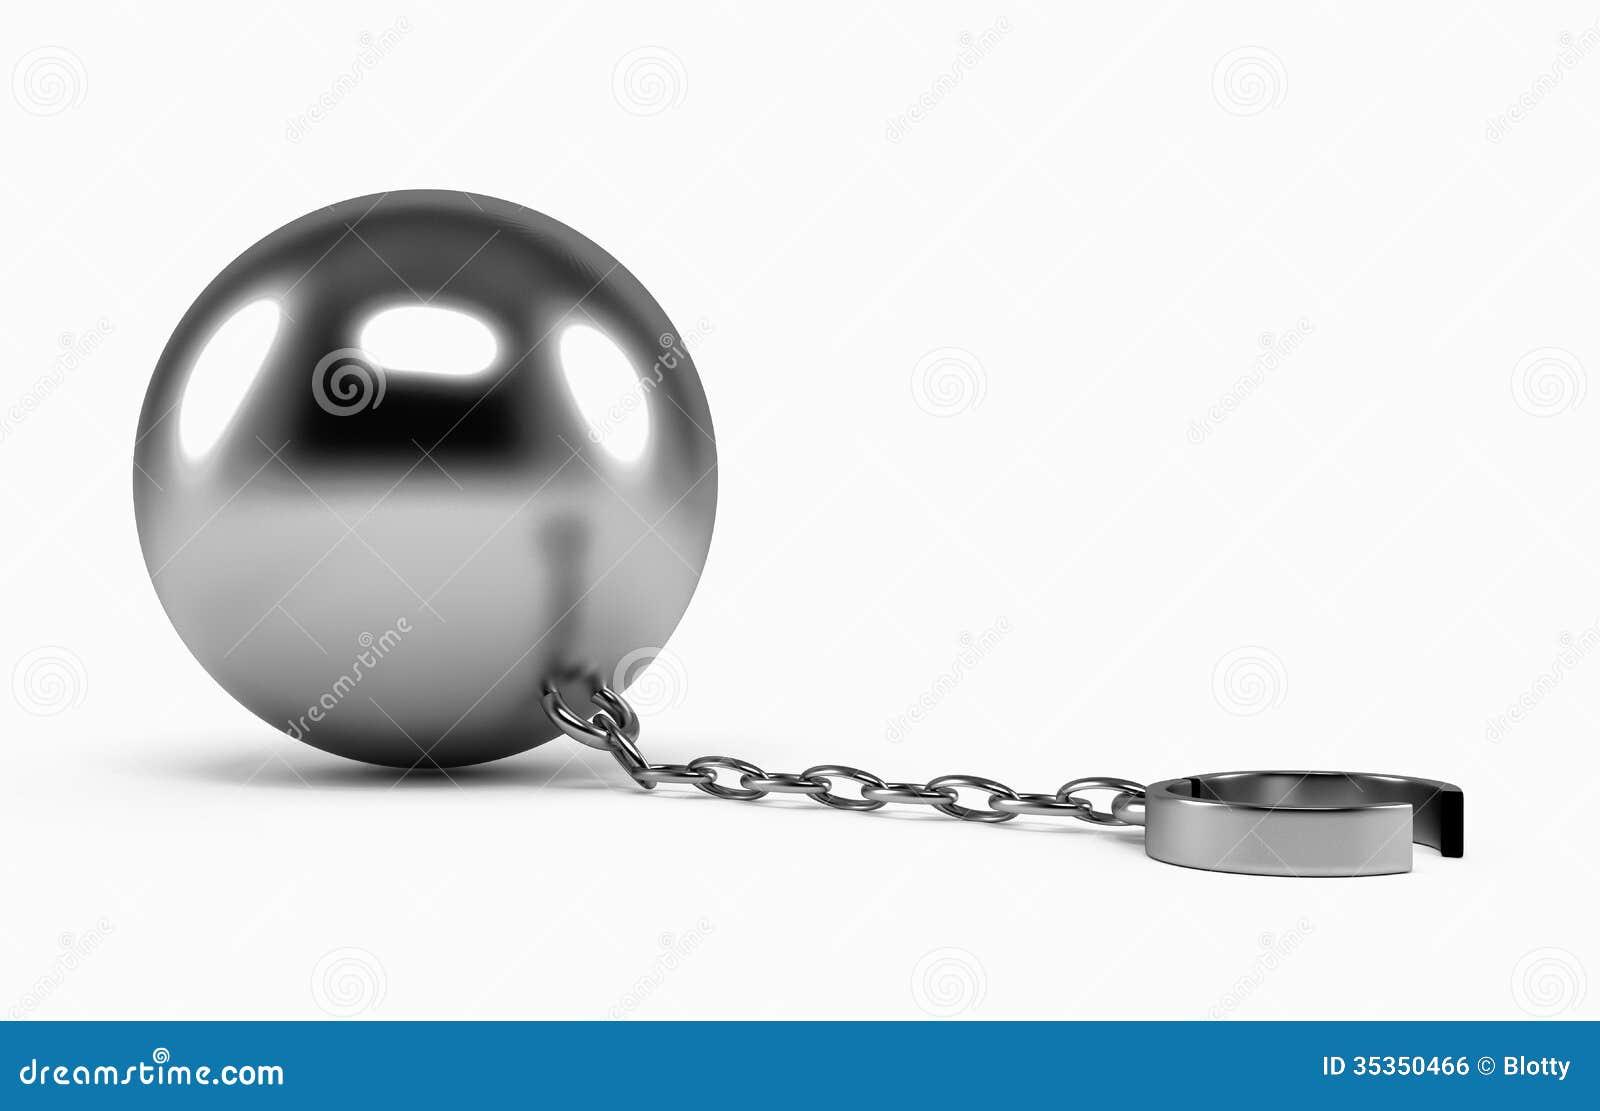 open prisoner shackle royalty free stock image